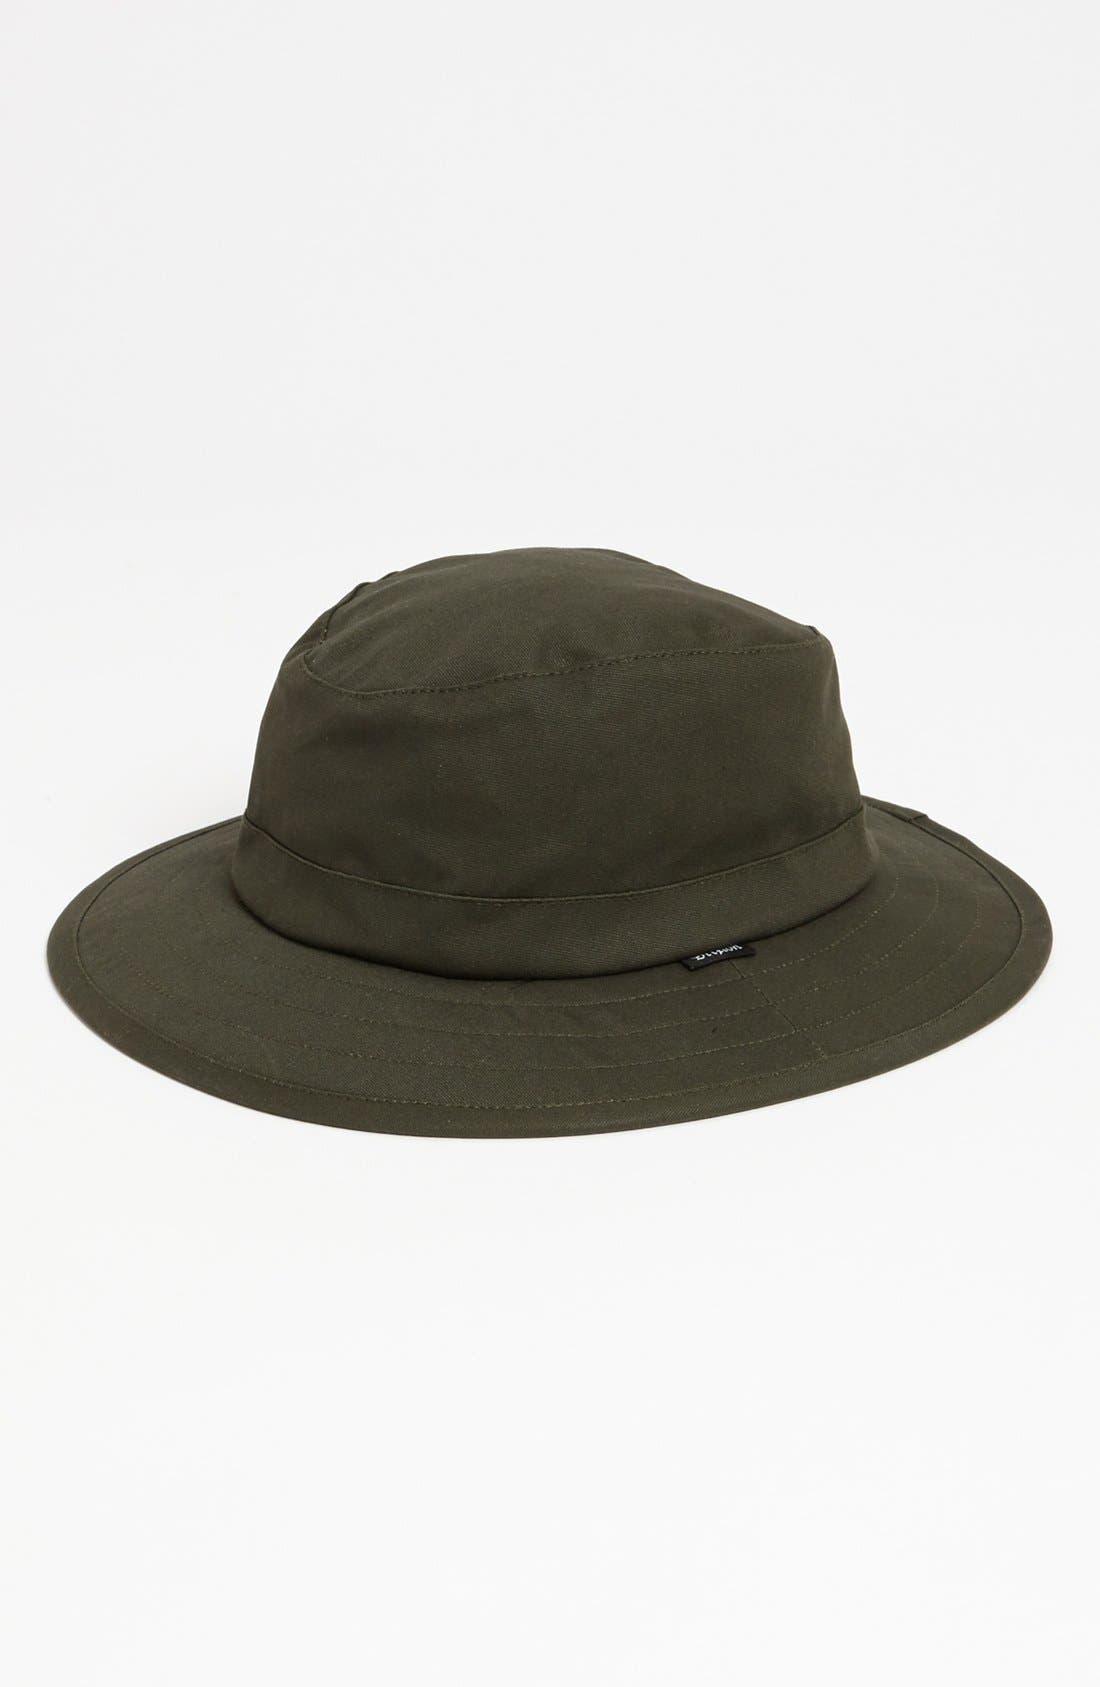 Alternate Image 1 Selected - Brixton 'Tracker' Bucket Hat